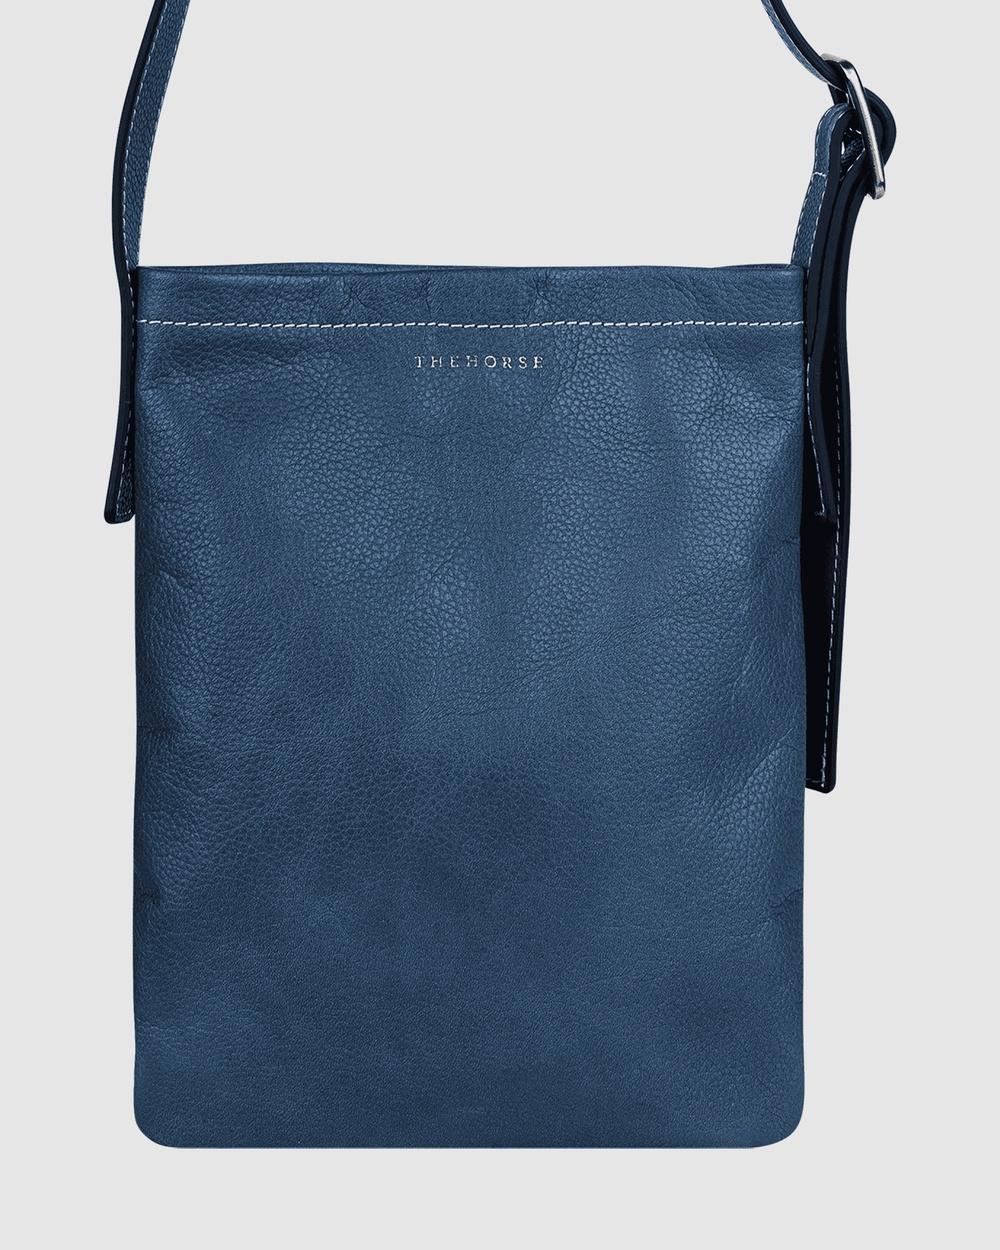 The Horse Eadie Slouch Bags Ink / Tan Australia